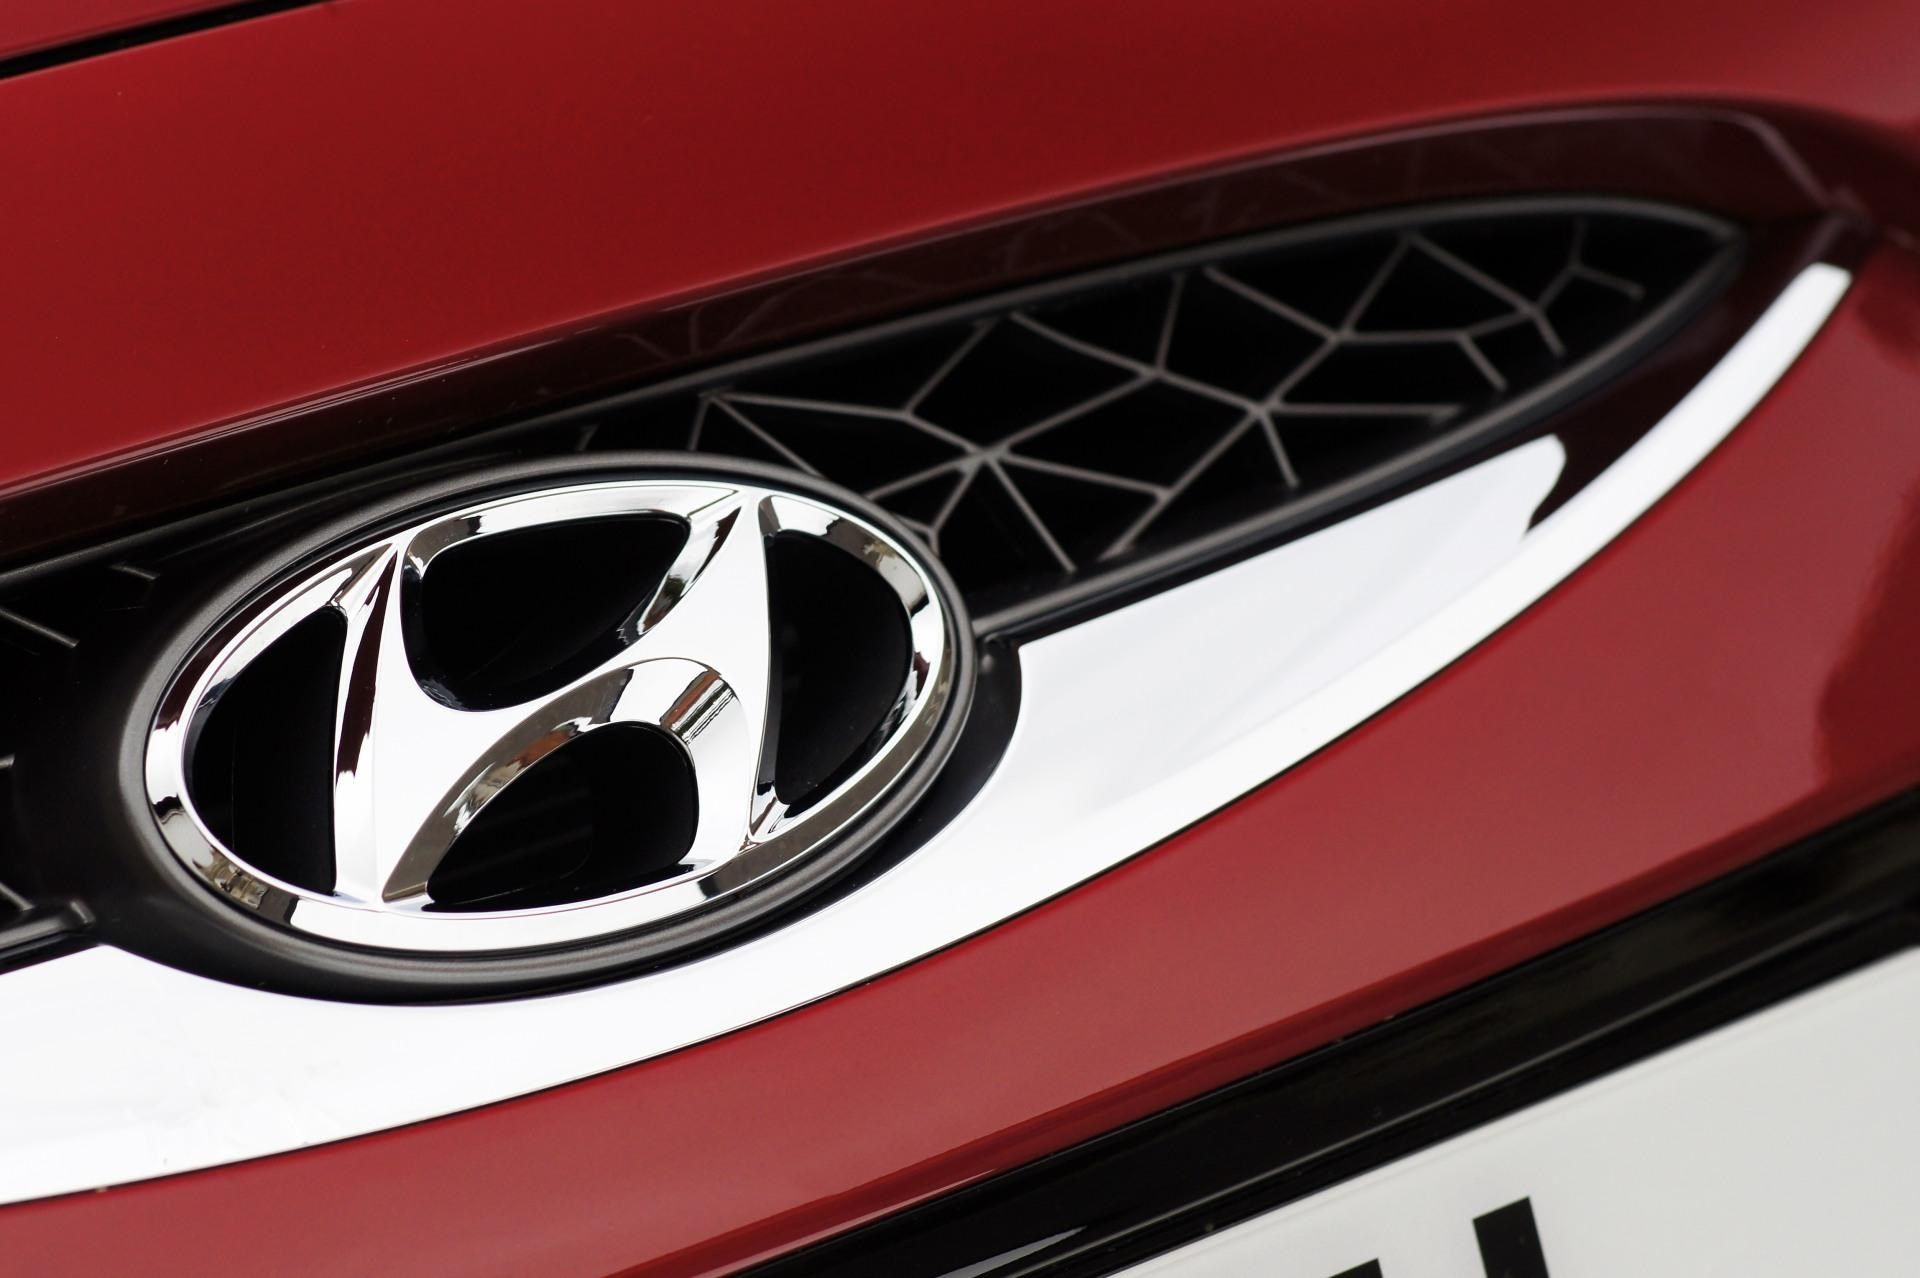 Hyundai Logo Wallpaper Hd Hyundai Logo Hyundai Car Symbols [ 1278 x 1920 Pixel ]